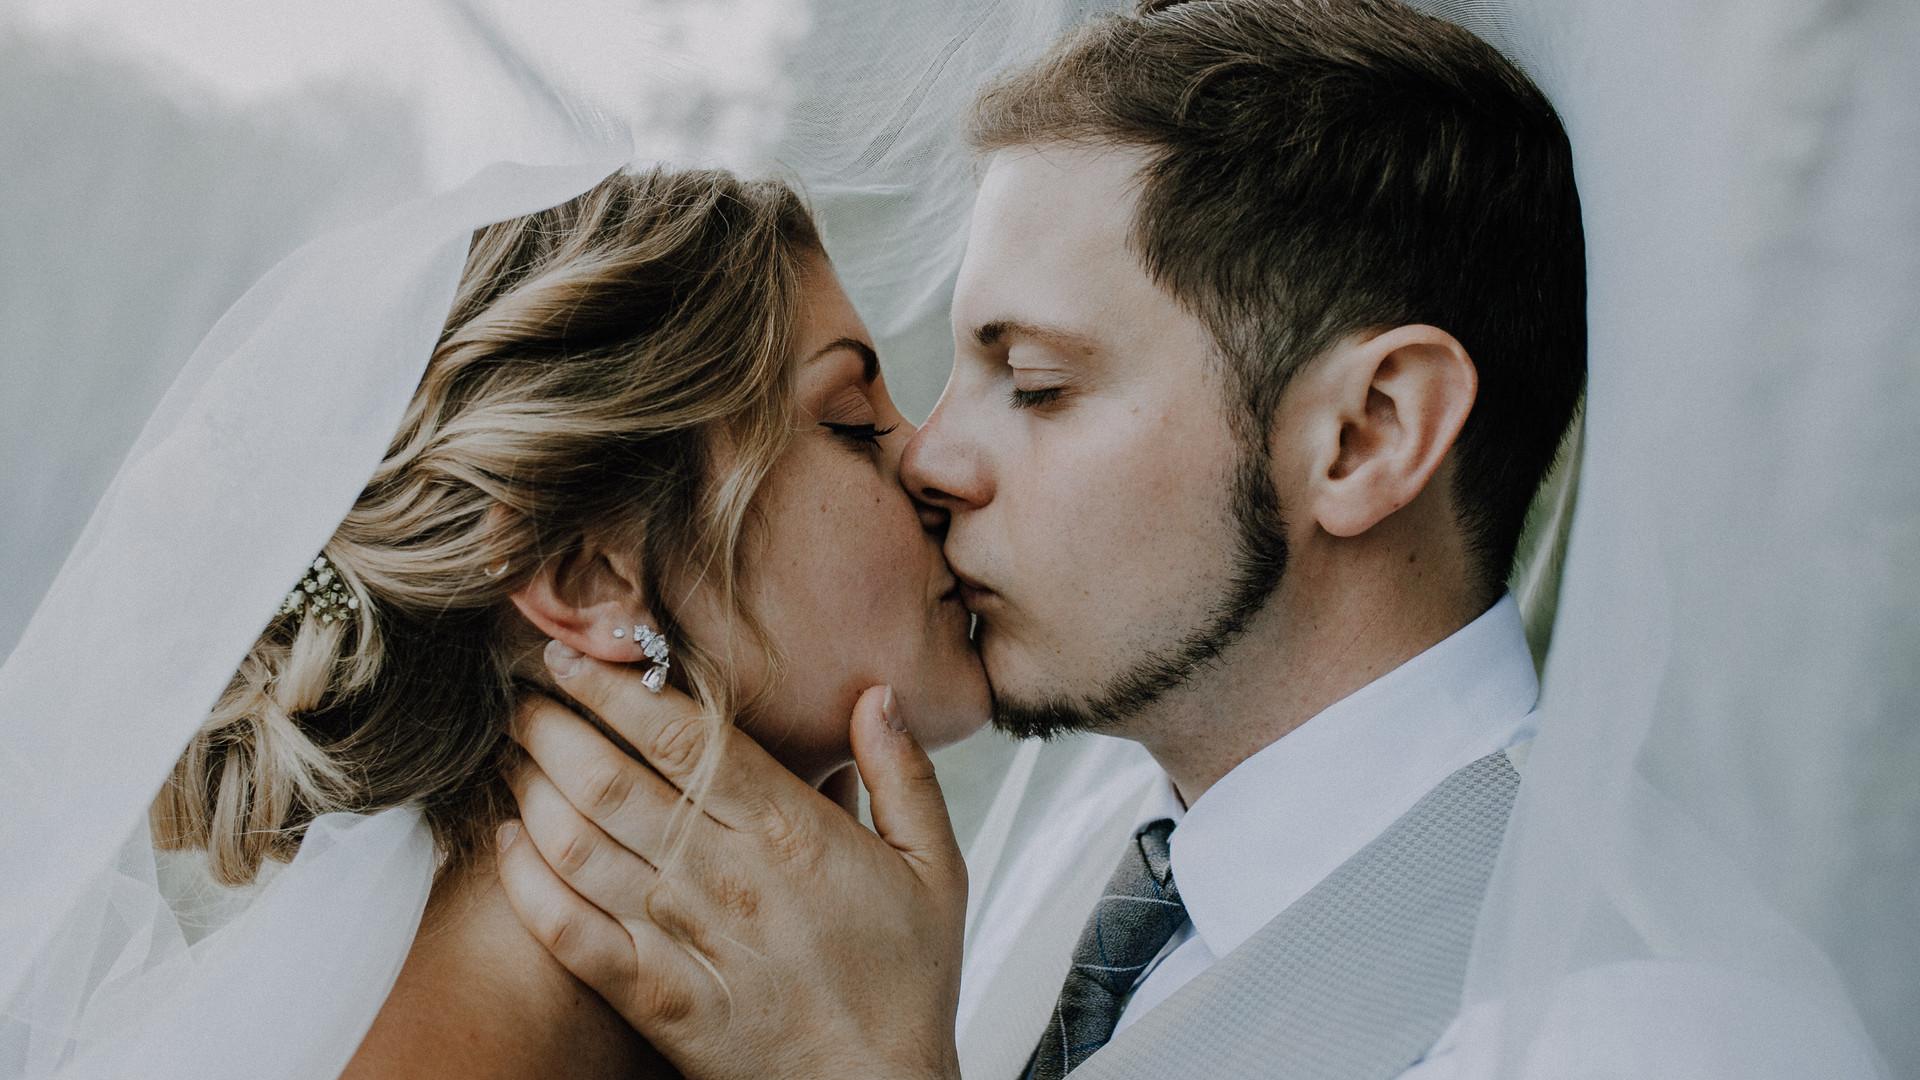 Hochtzeit_Brautpaarshooting_Carmen_Jablo